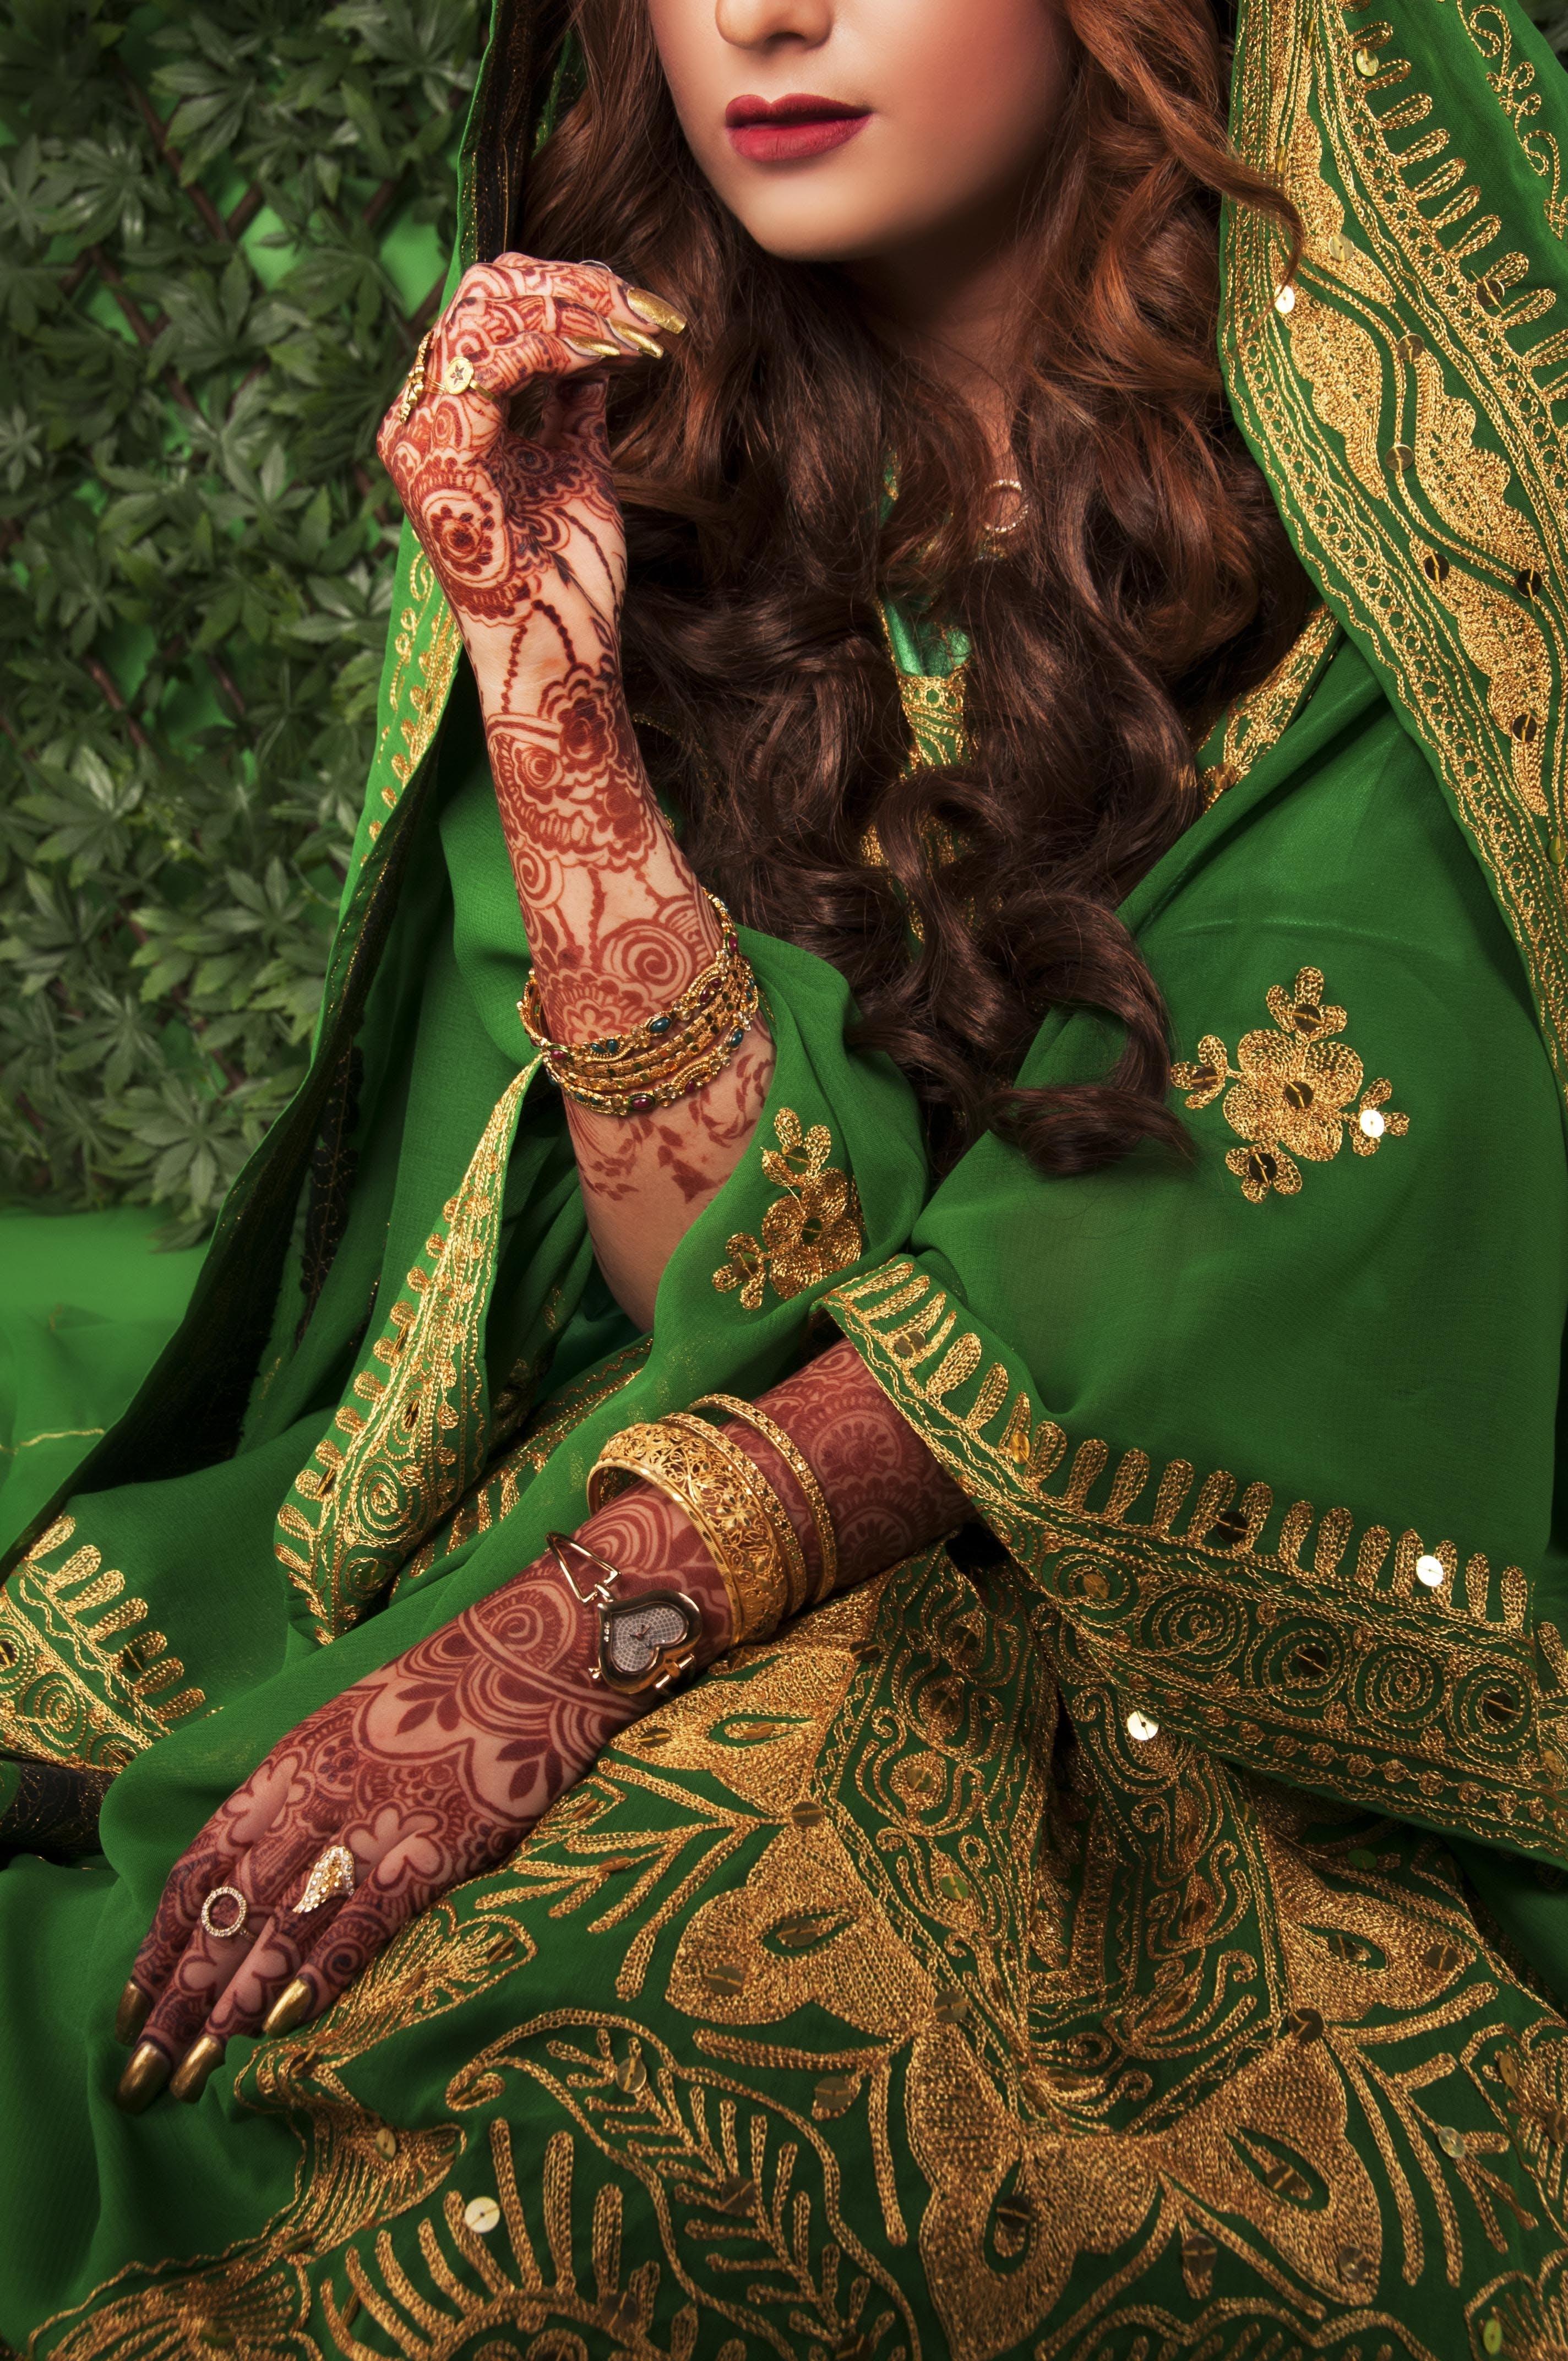 Woman Wearing Green Sari Dress